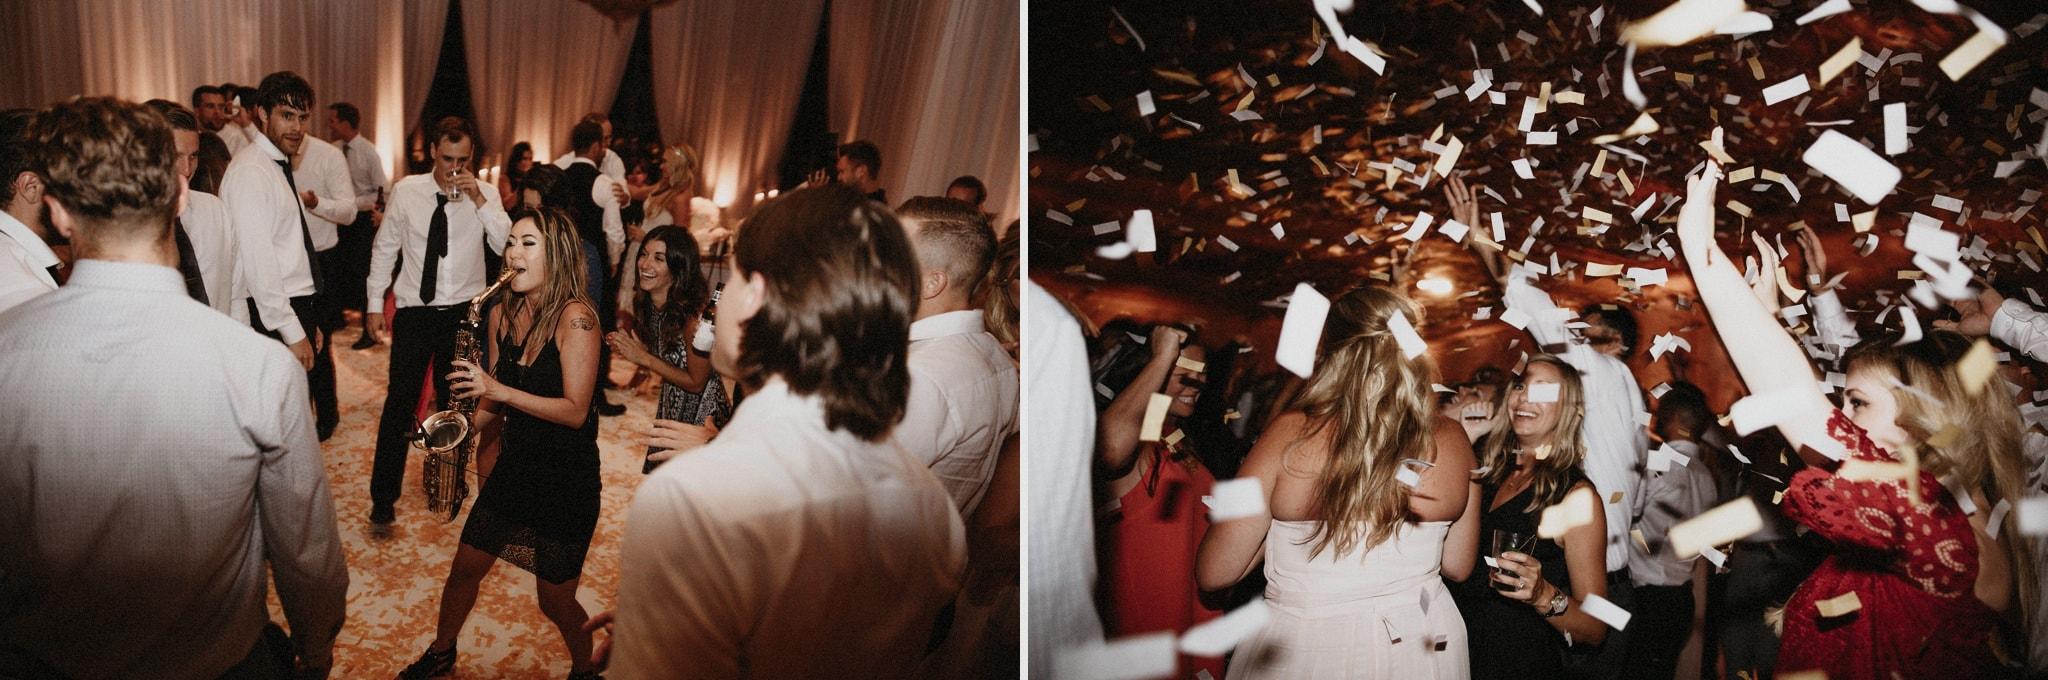 086-wedding-reception-dance-confetti-cannon.jpg